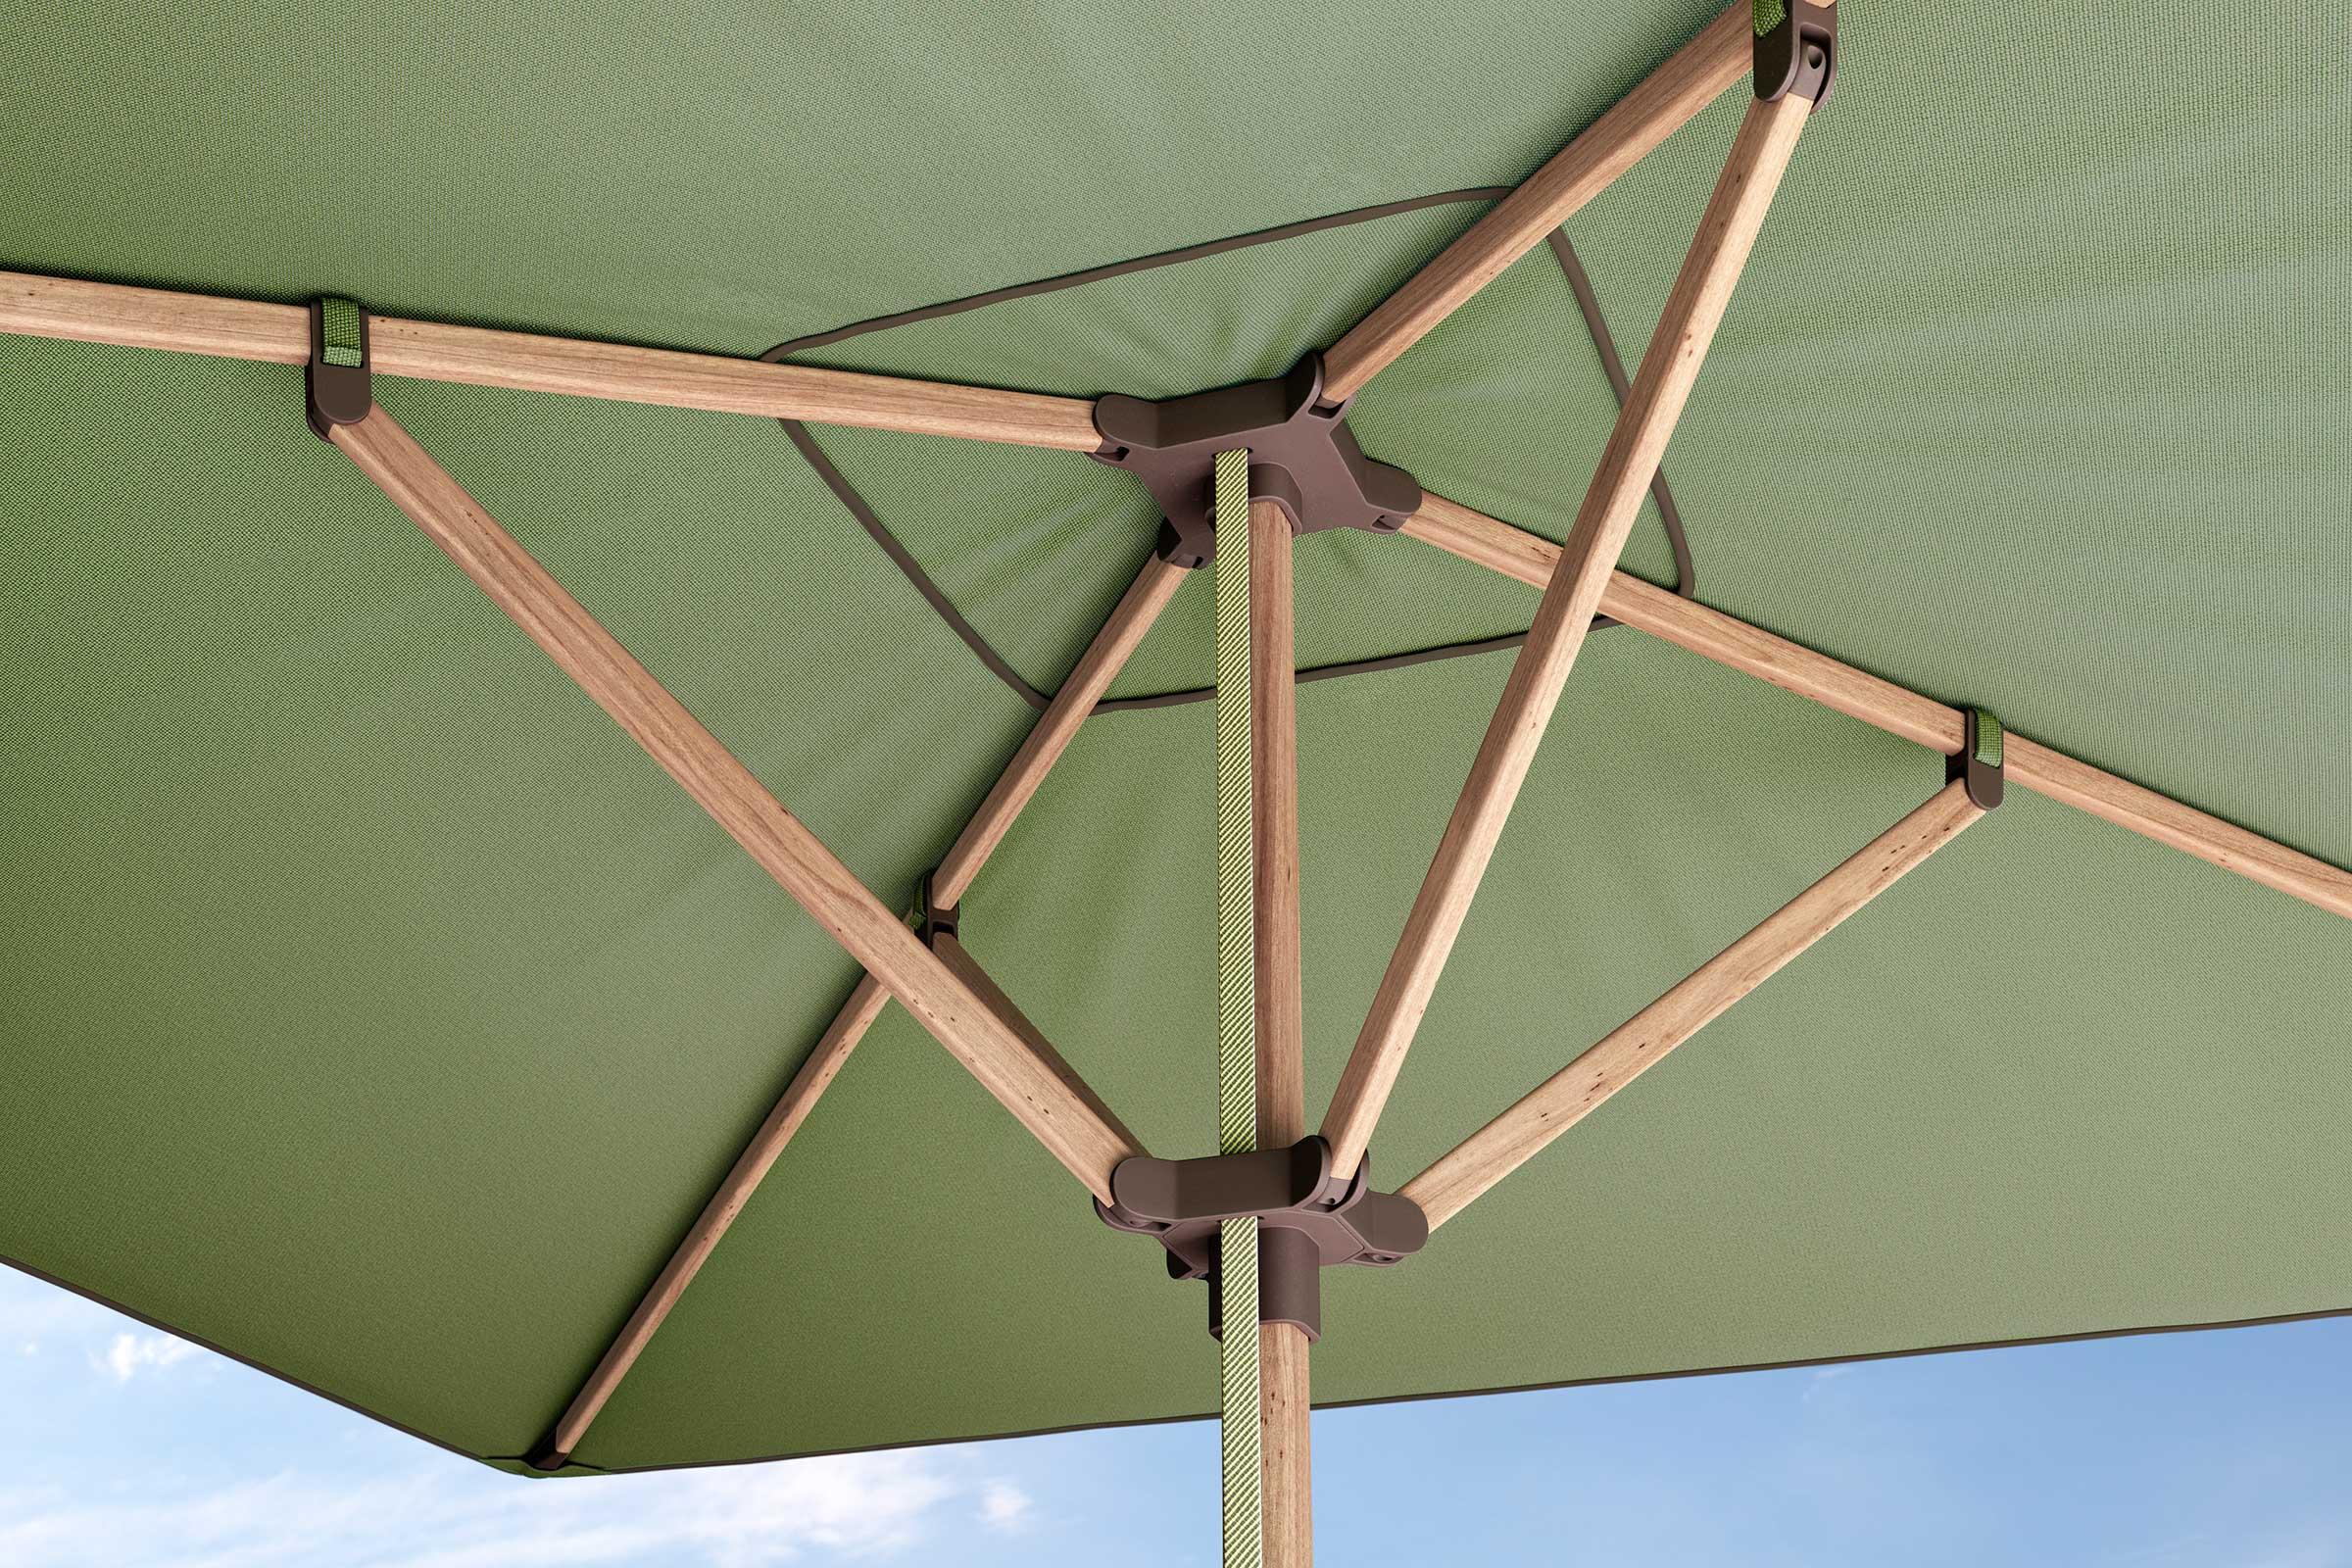 1627_0_meteo_parasol_aluwood.jpg